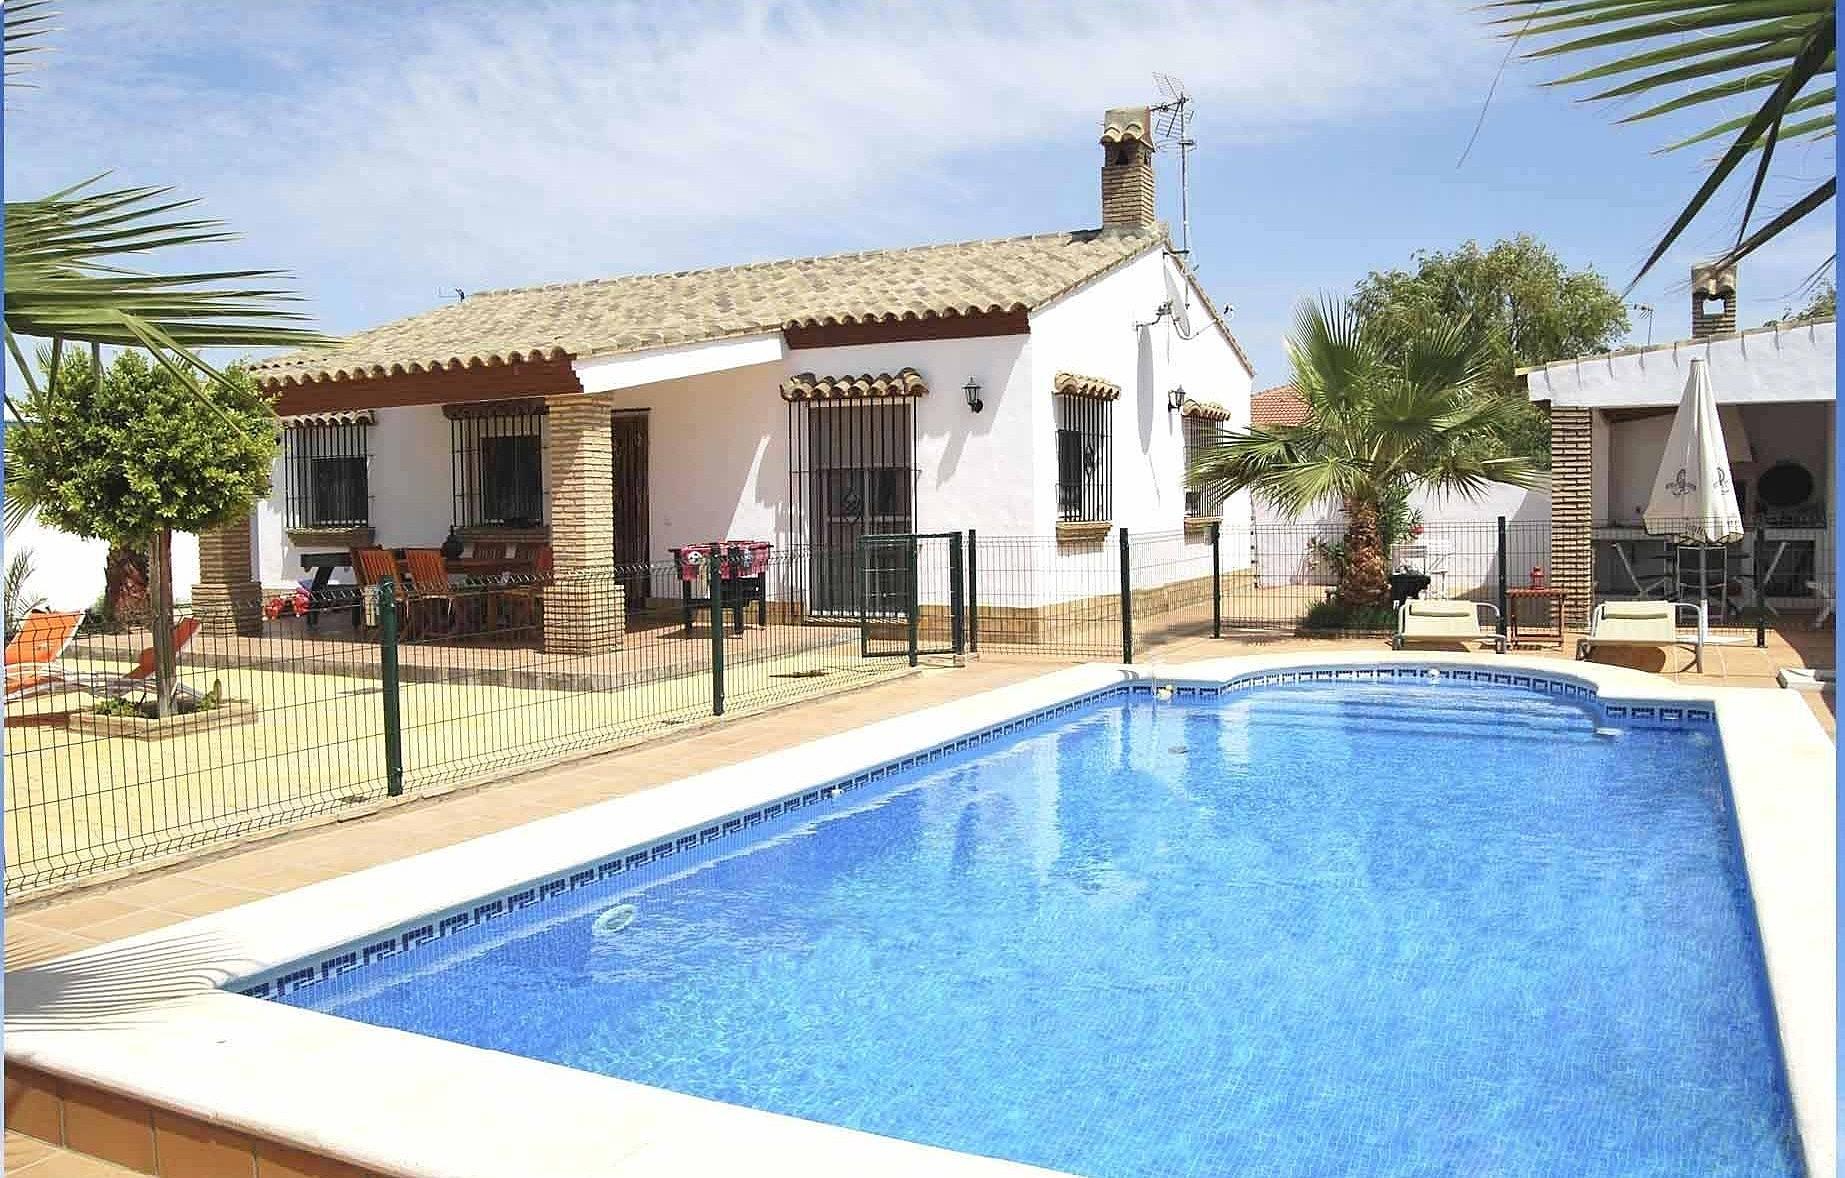 Casa de campo tipo chalet con piscina privada roche for Casas con piscina jerez de la frontera